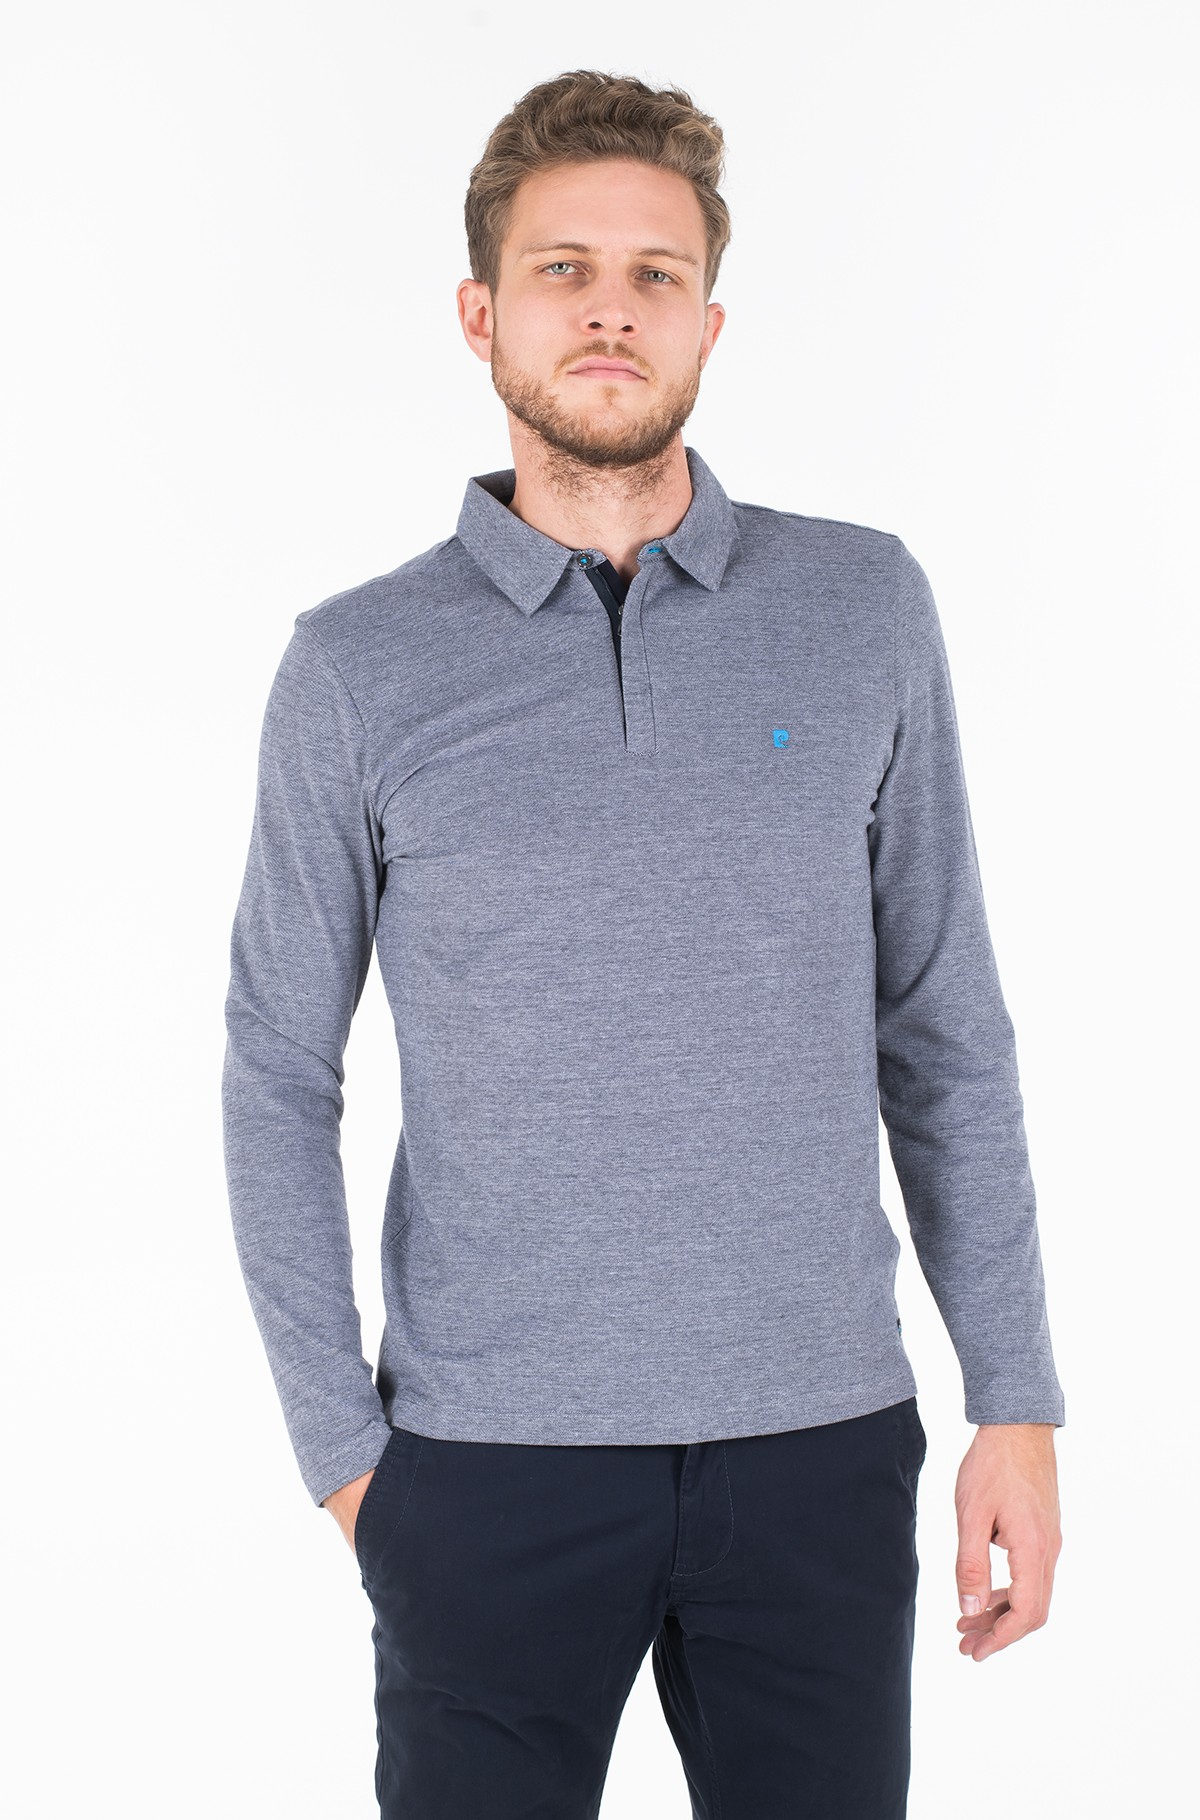 Polo marškinėliai ilgomis rankovėmis 53564-92316-full-1